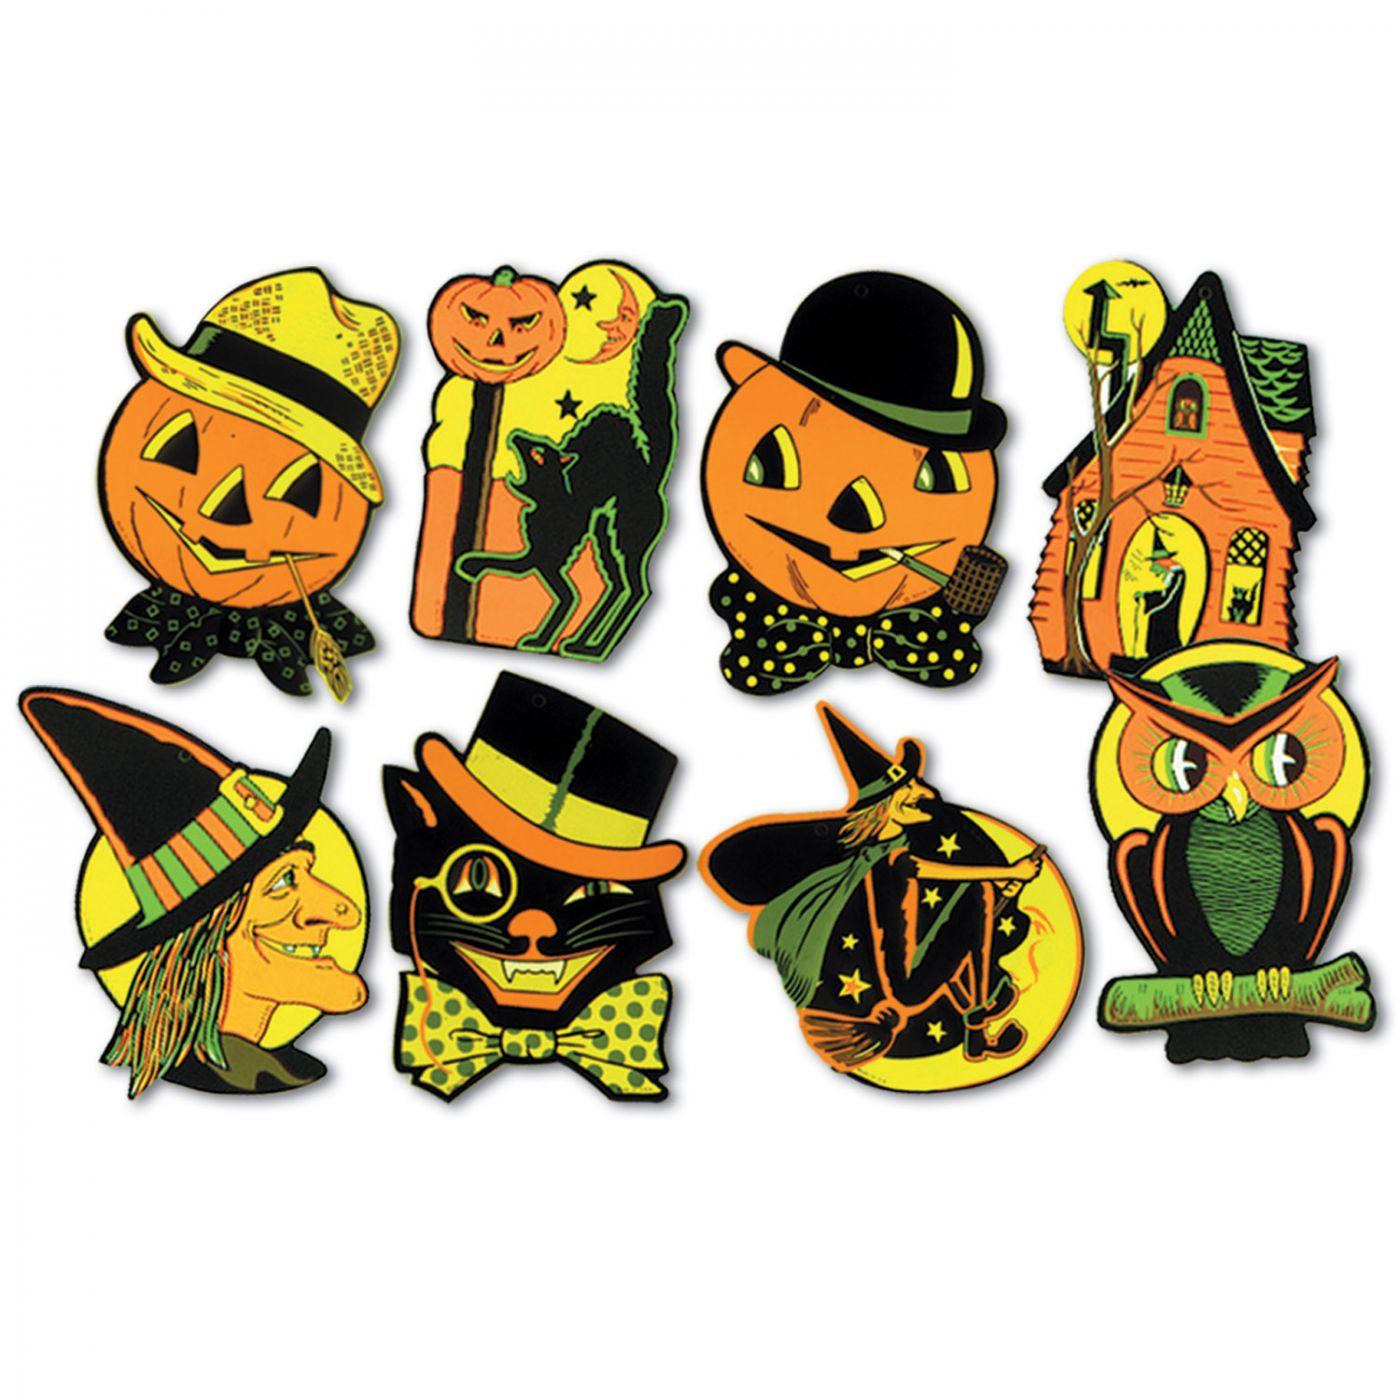 Pkgd Halloween Cutouts (24) image